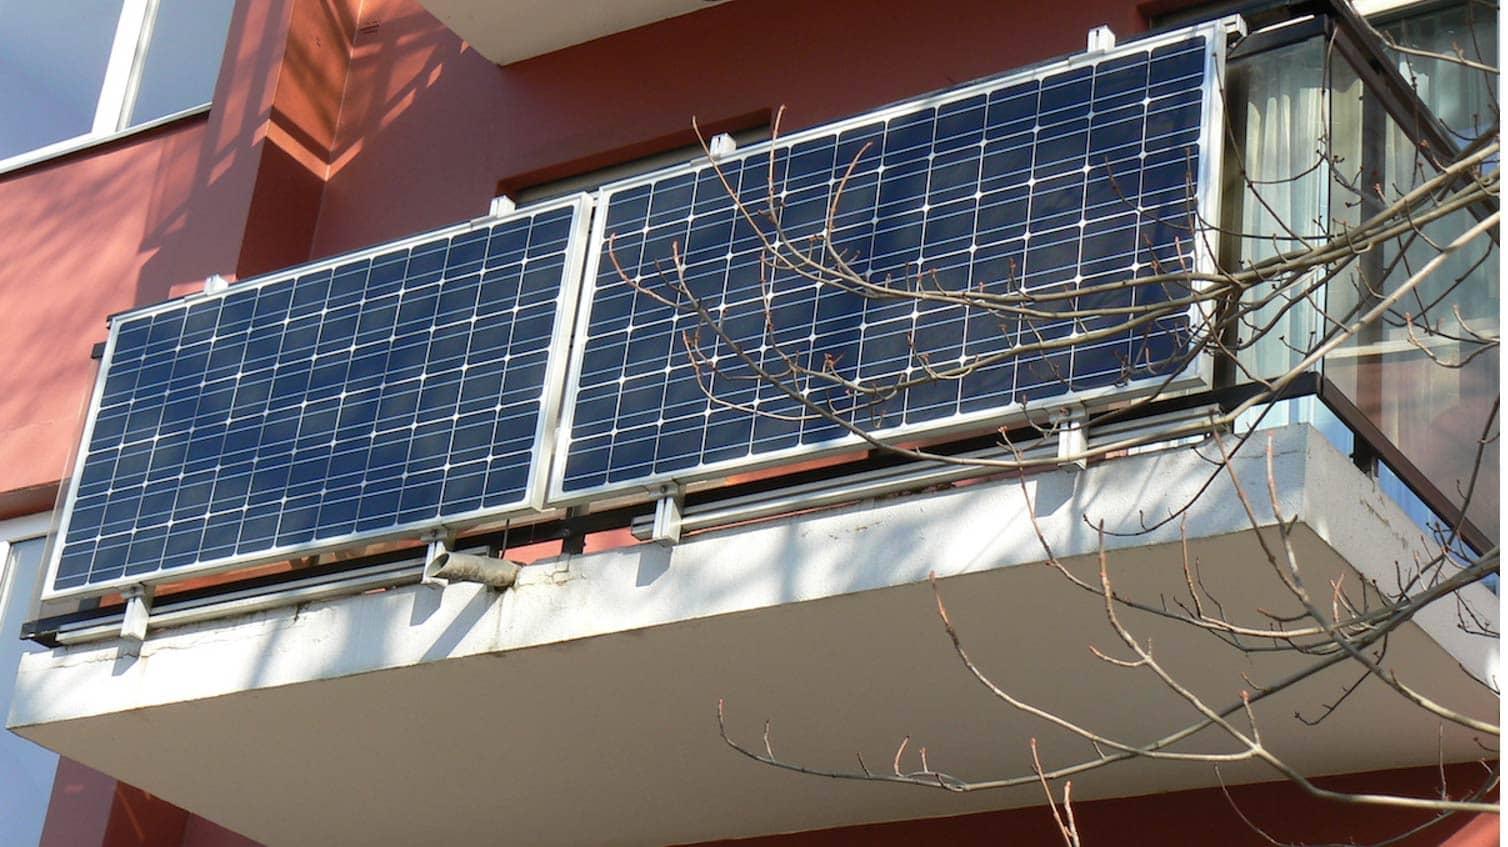 Erneuerbare Energie: Photovoltaikanlage an Hausfassade